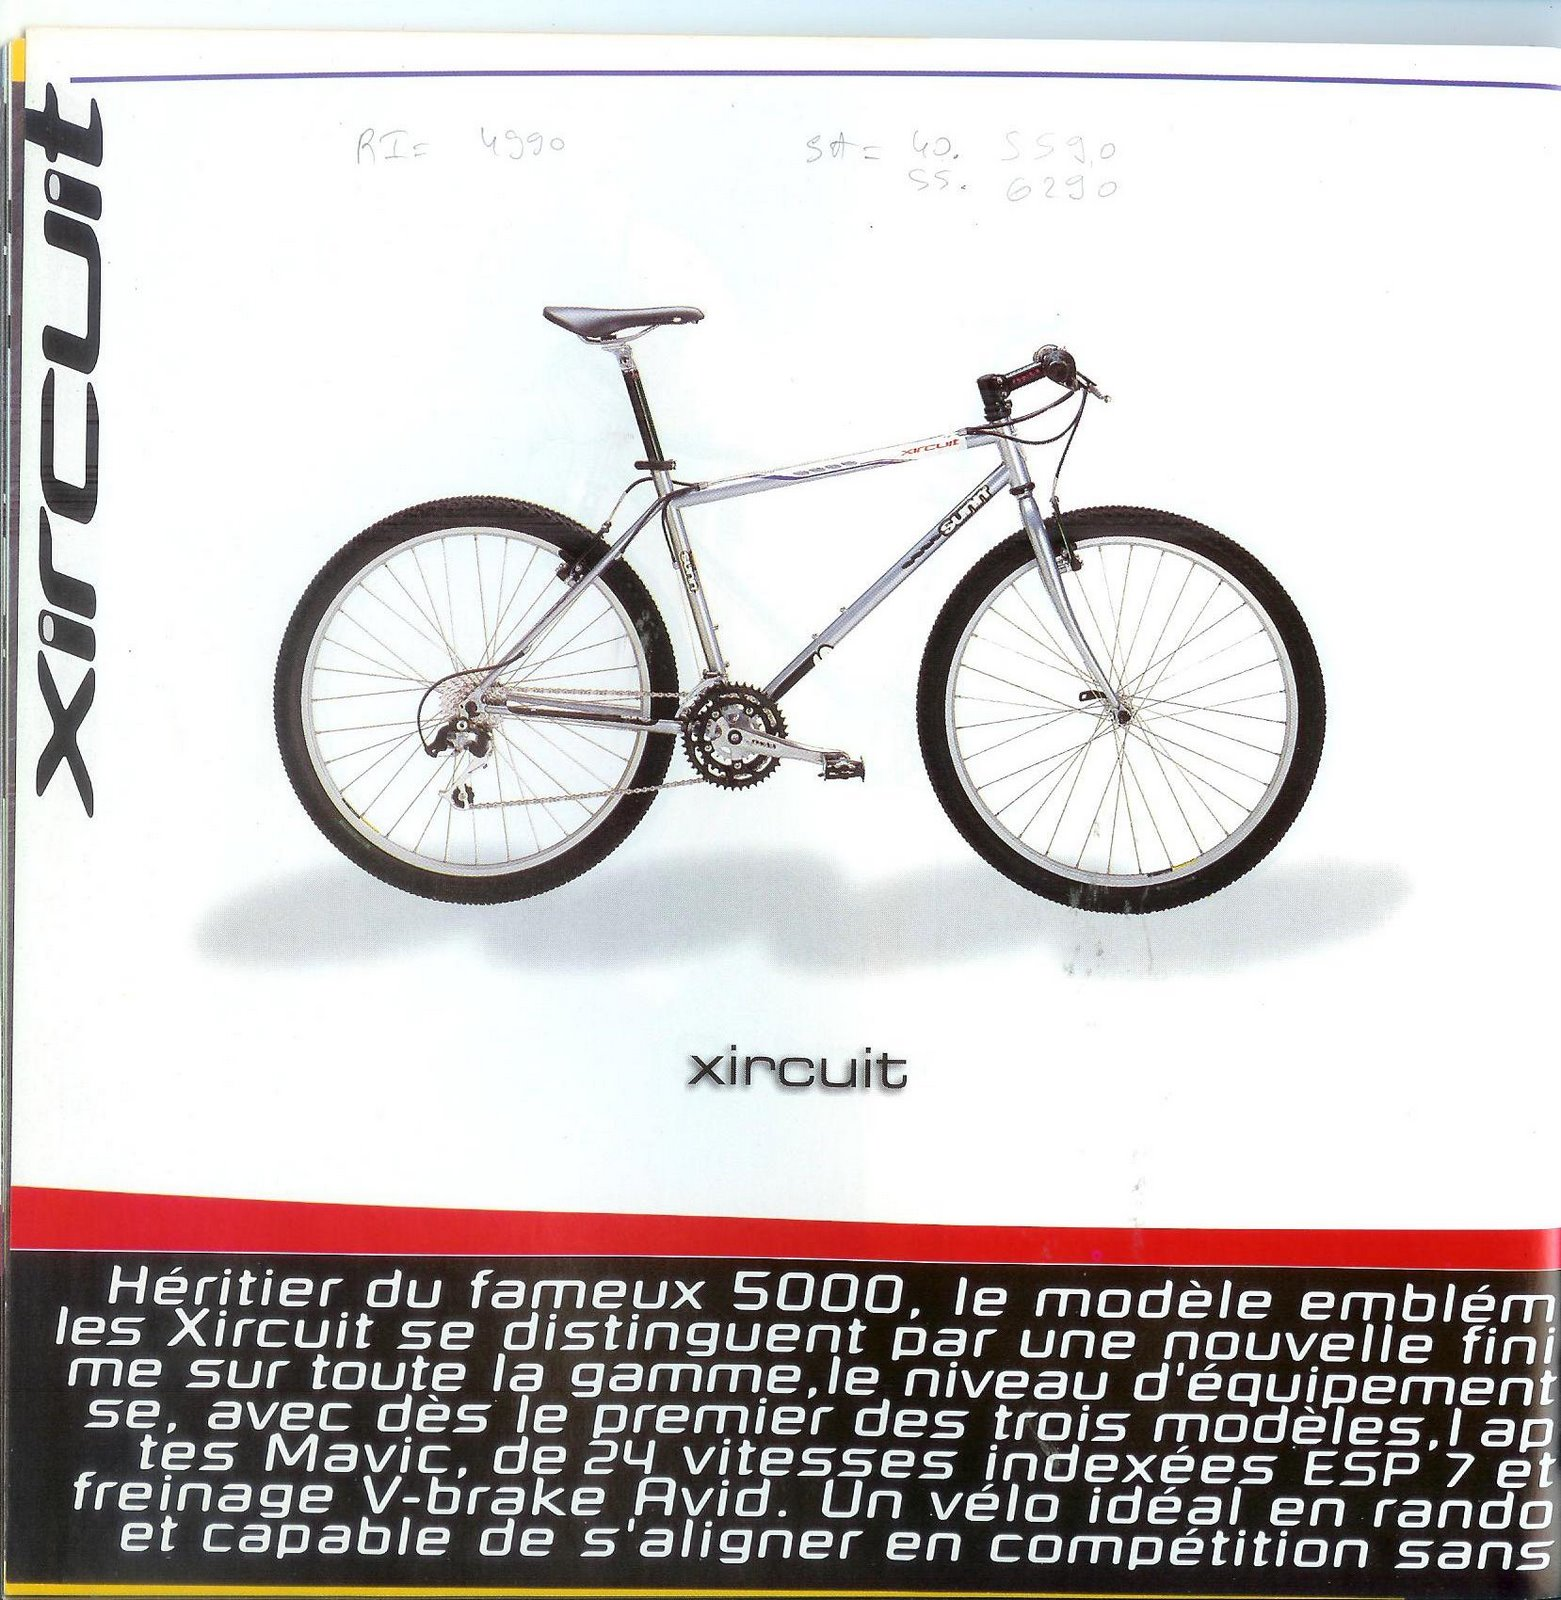 Sunn Vertik 1996 + Xircuit 1997 CATALOGUES%2BSUNN%2BCYCLES%2B1997%2B%252875%2529